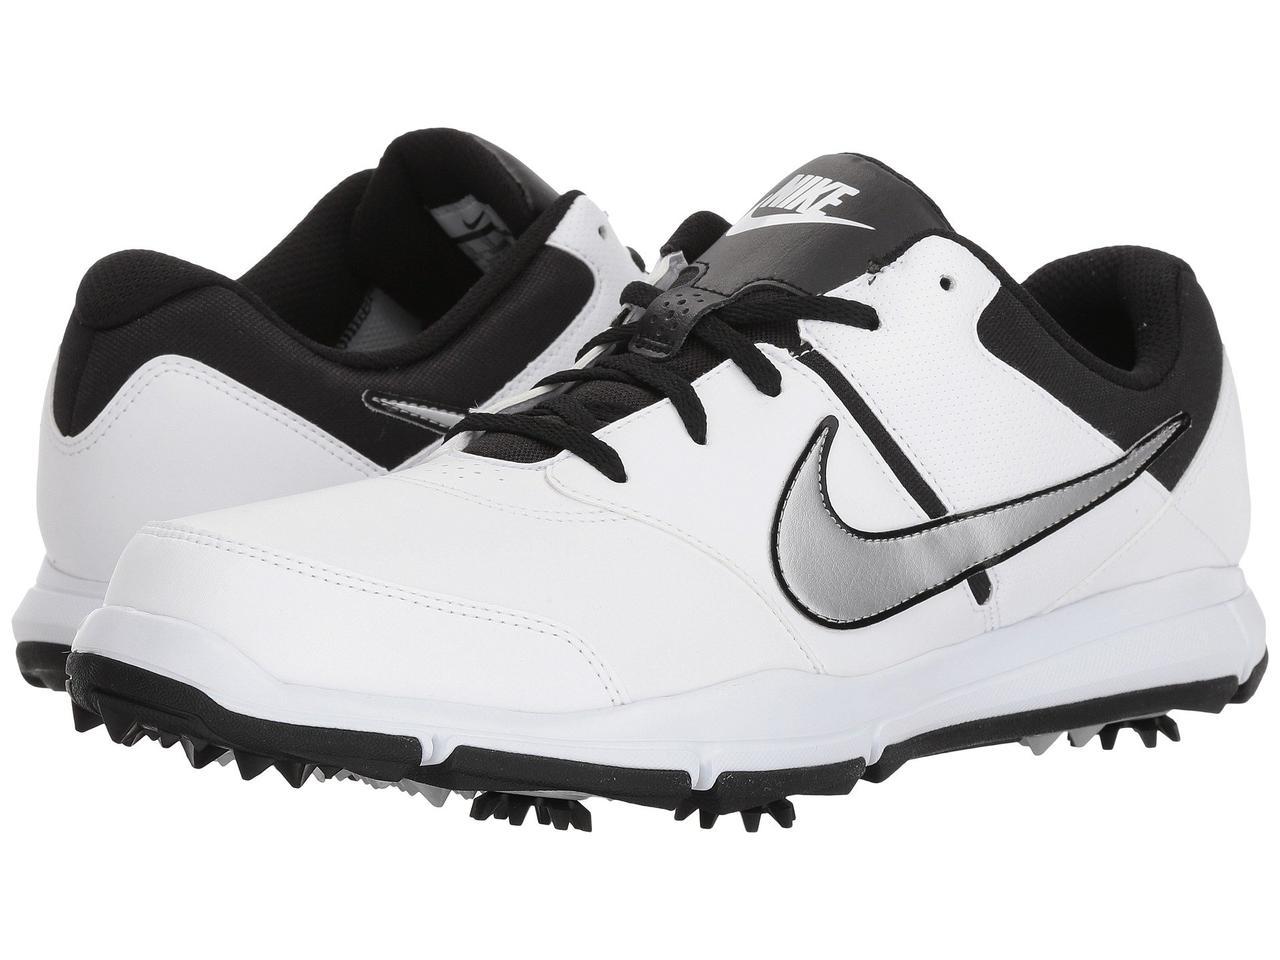 Кроссовки/Кеды (Оригинал) Nike Golf Durasport 4 White/Metallic Silver/Black